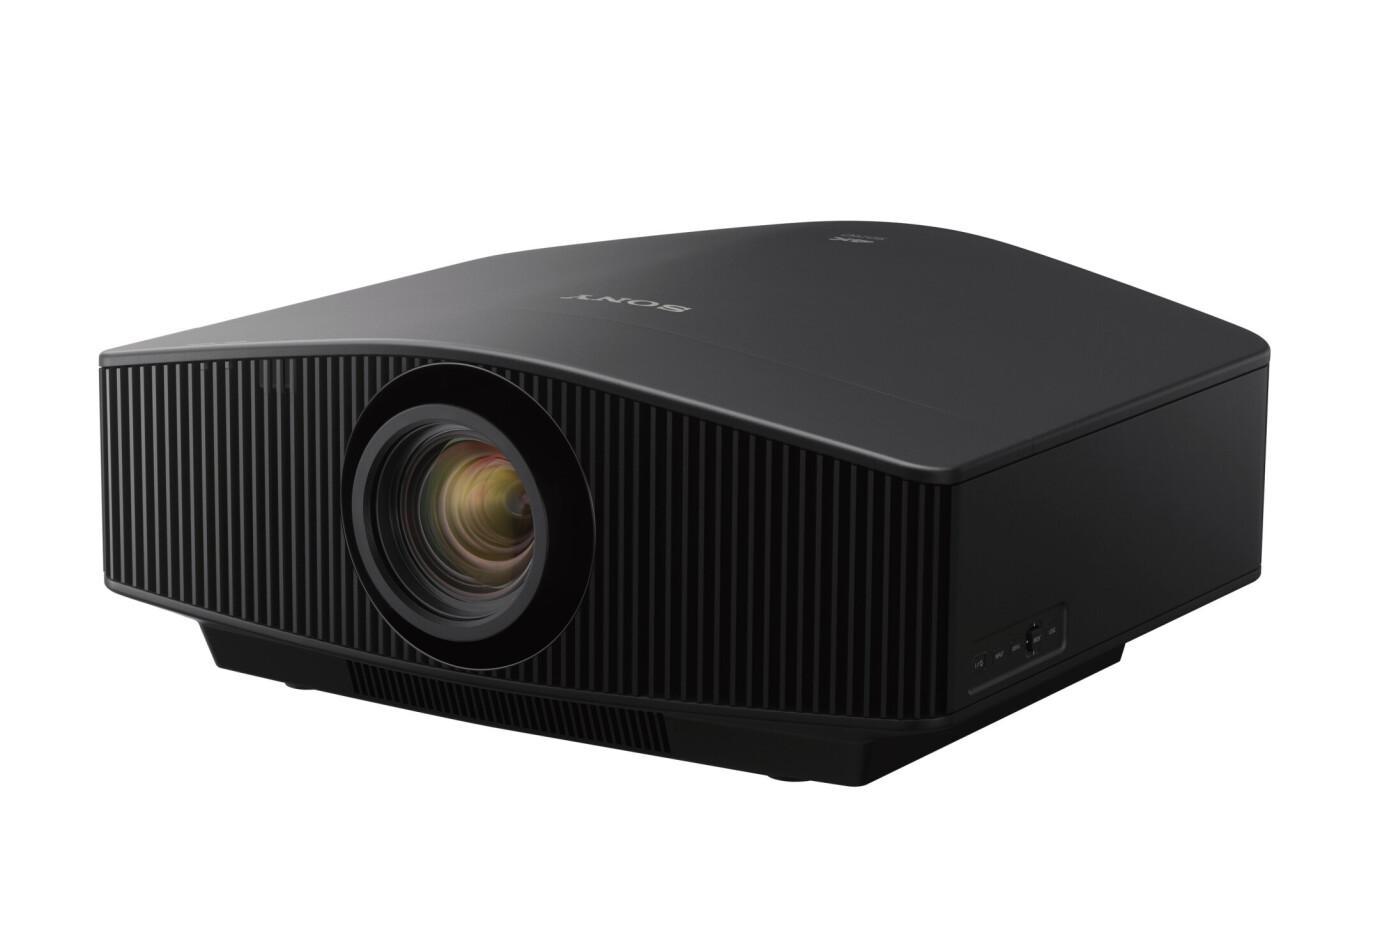 Sony VPL-VW870ES